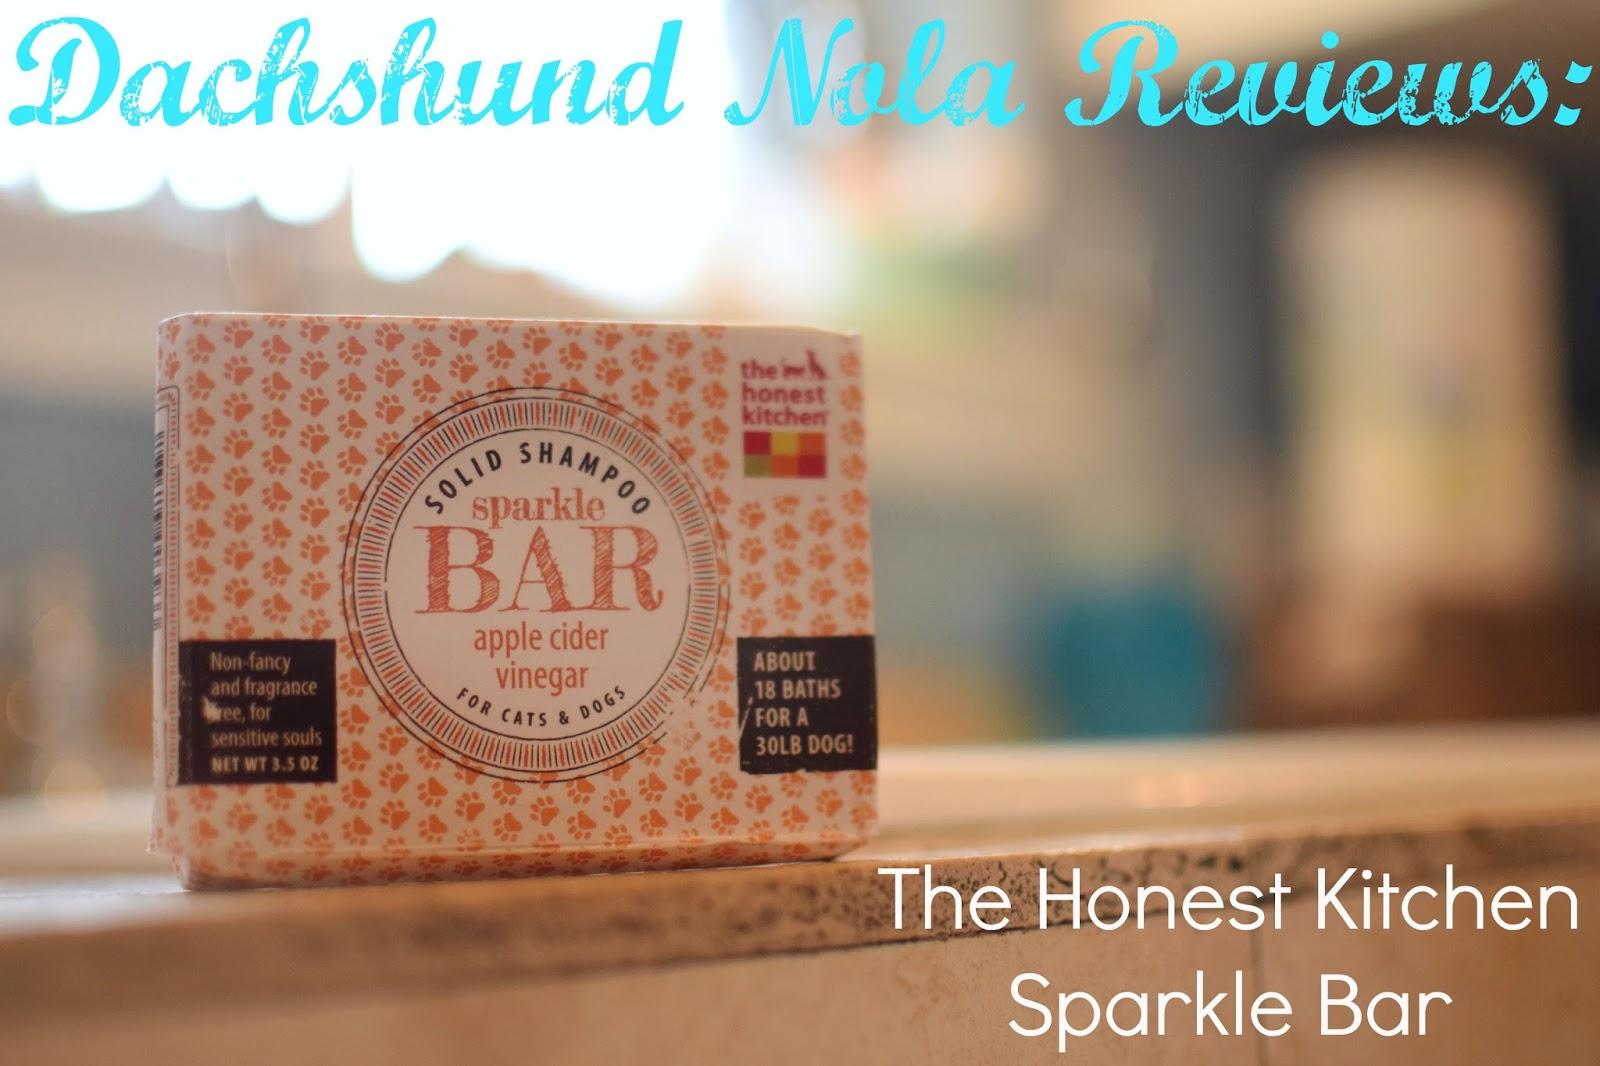 Dachshund Nola: Dachshund Nola Reviews: The Honest Kitchen Sparkle Bar